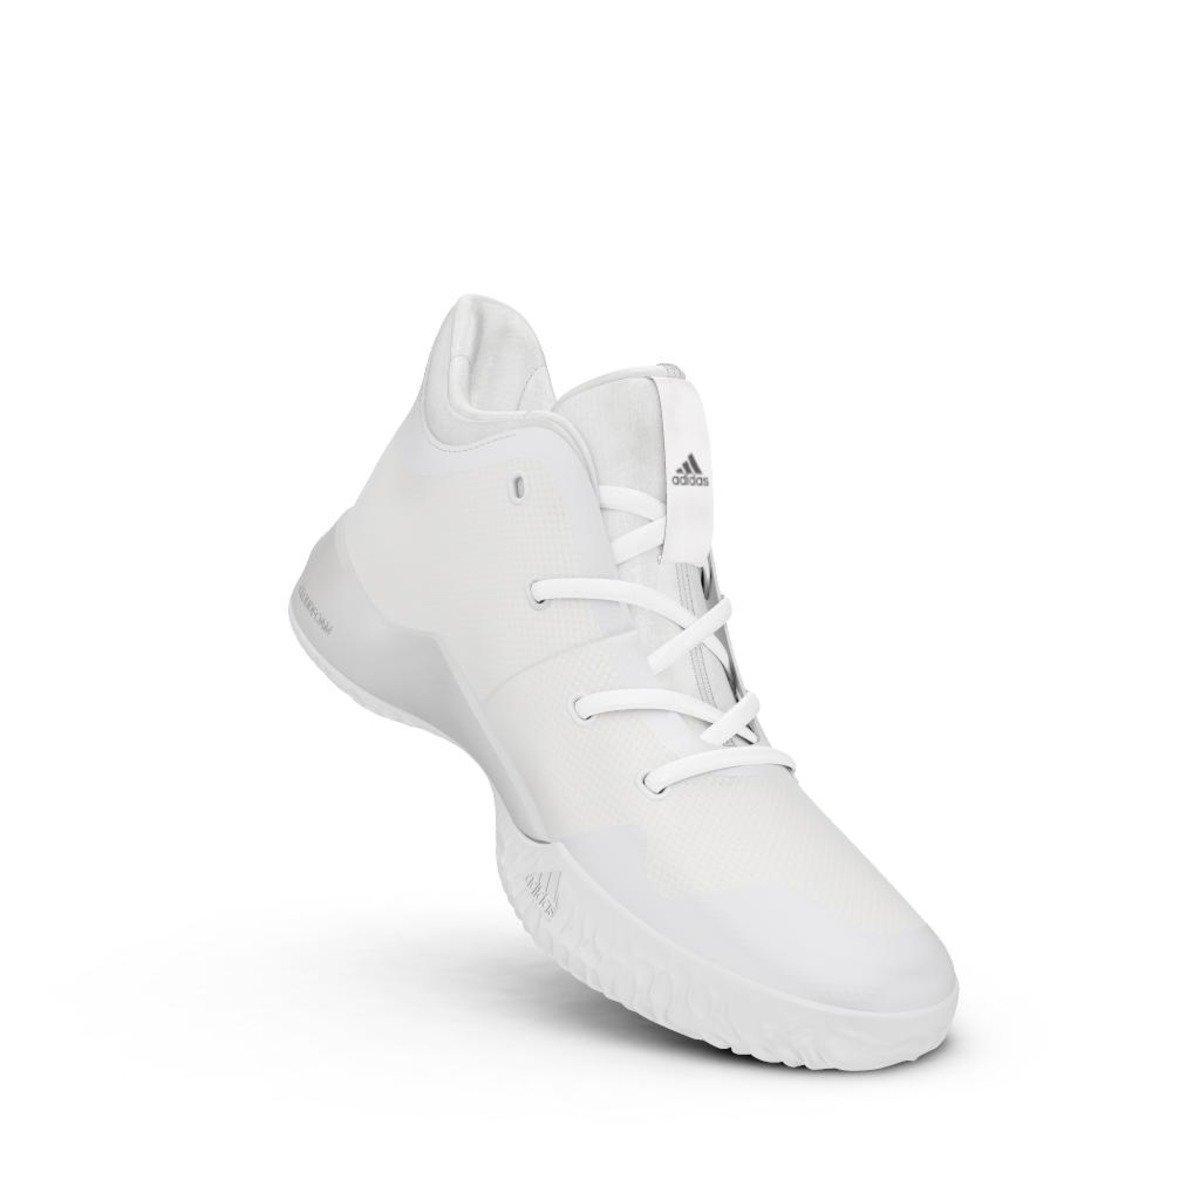 9e00f91c859b Adidas Rise Up 2 Shoes- CQ0560